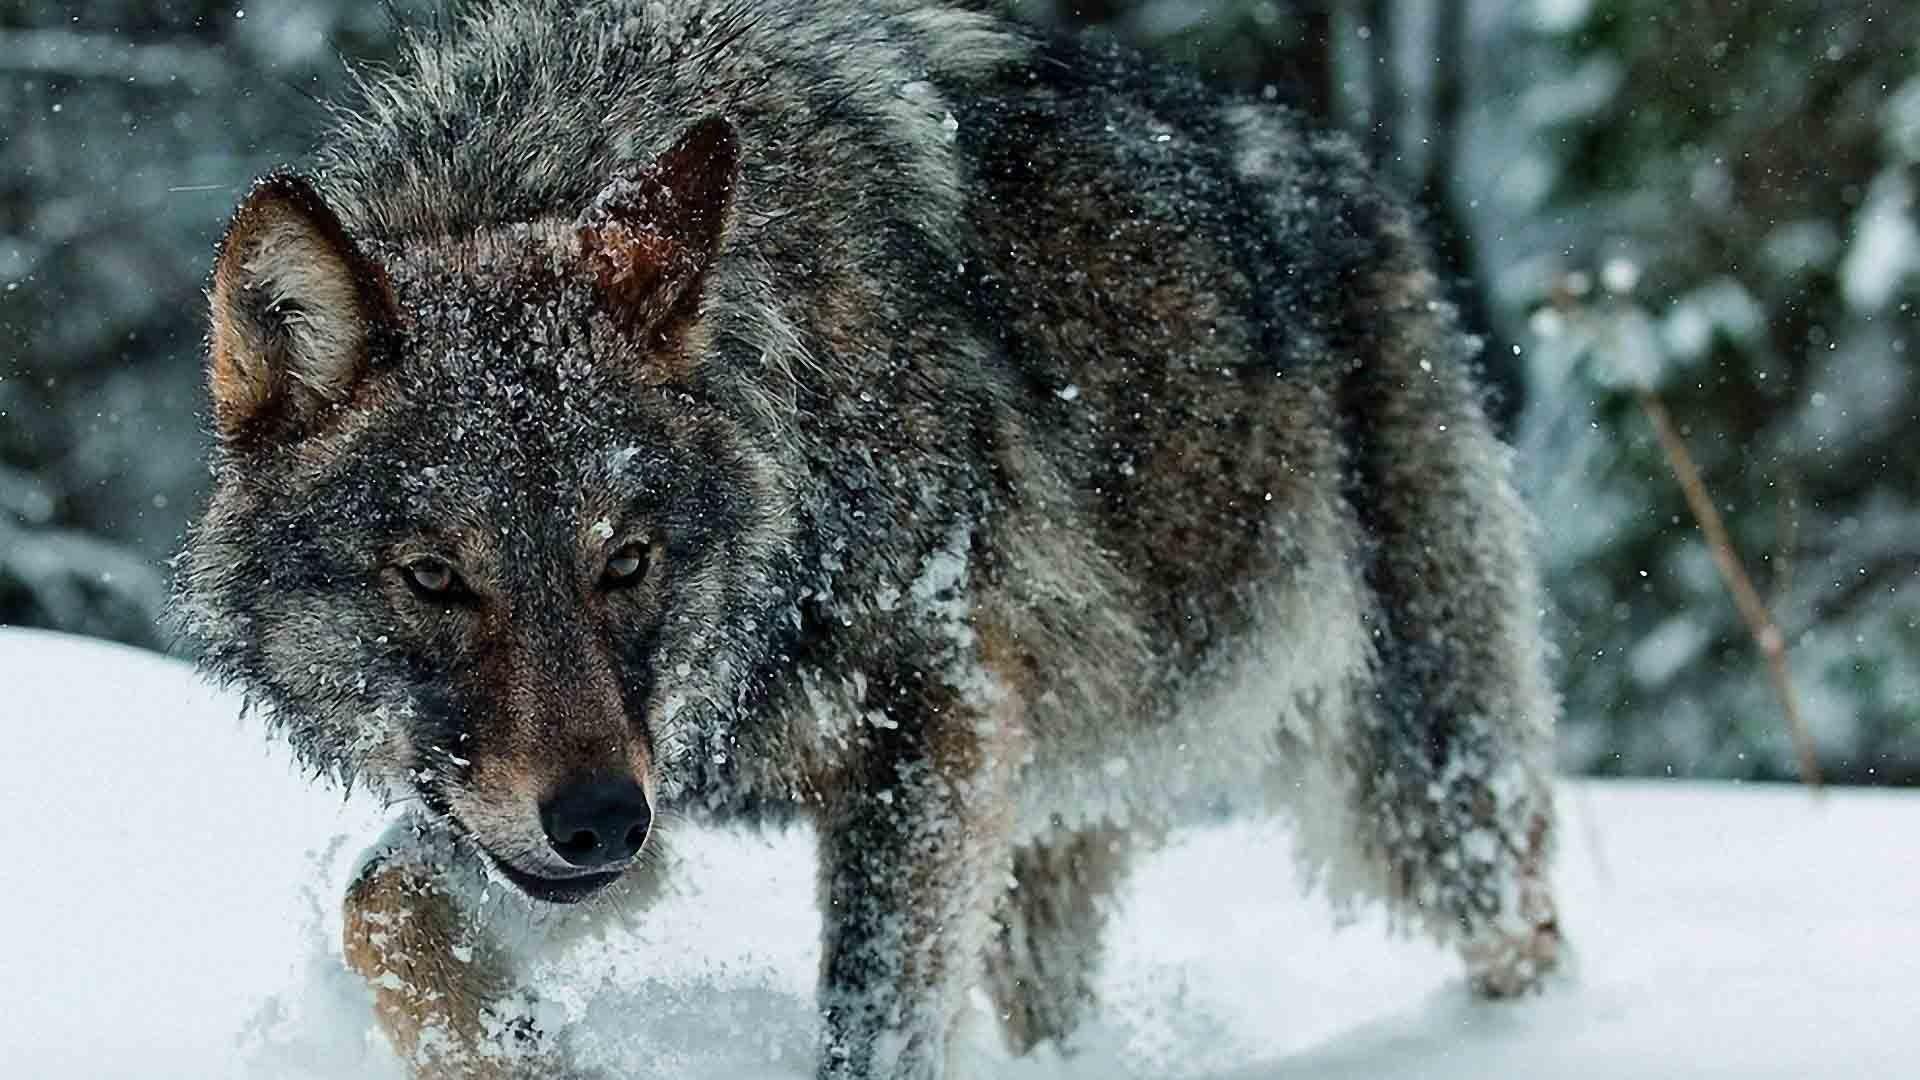 Full HD p Wolf Wallpapers HD, Desktop Backgrounds 1920×1080 Wolf Wallpaper  (39